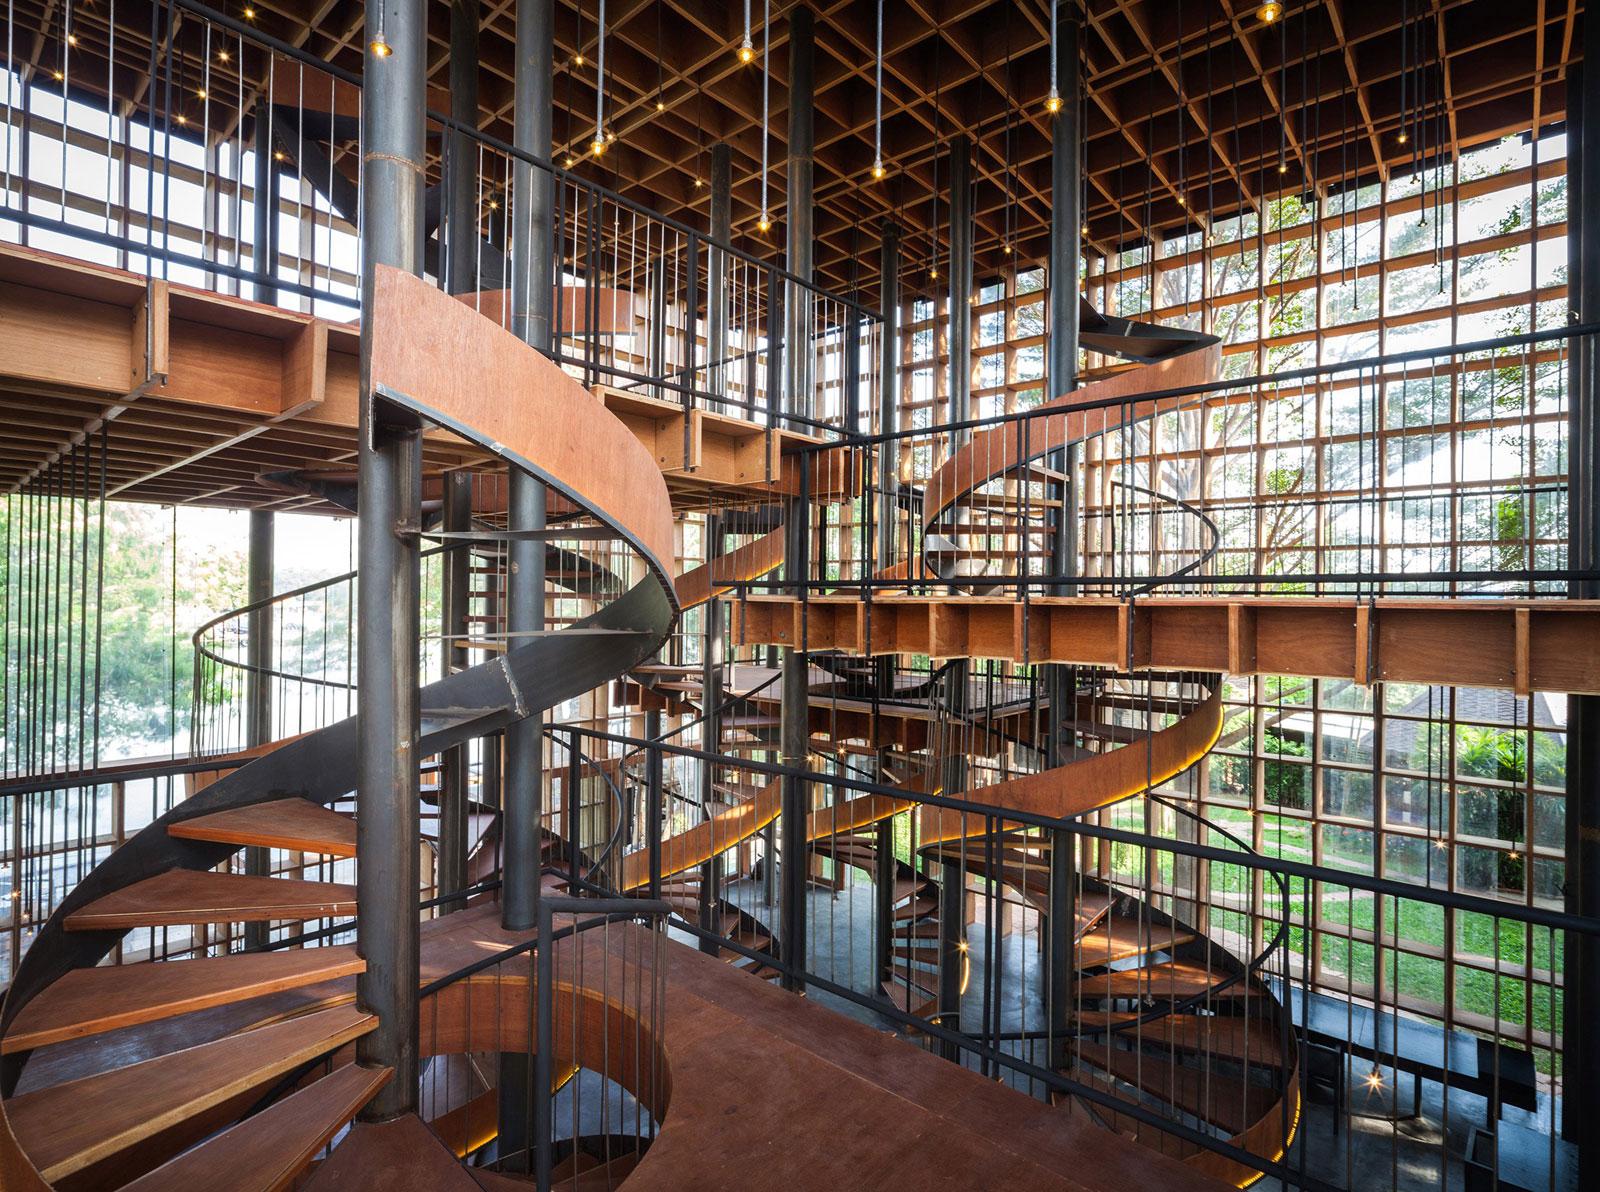 wine-bangkok-project-studio-architecture-public-leisure-thailand-_dezeen_2364_col_26